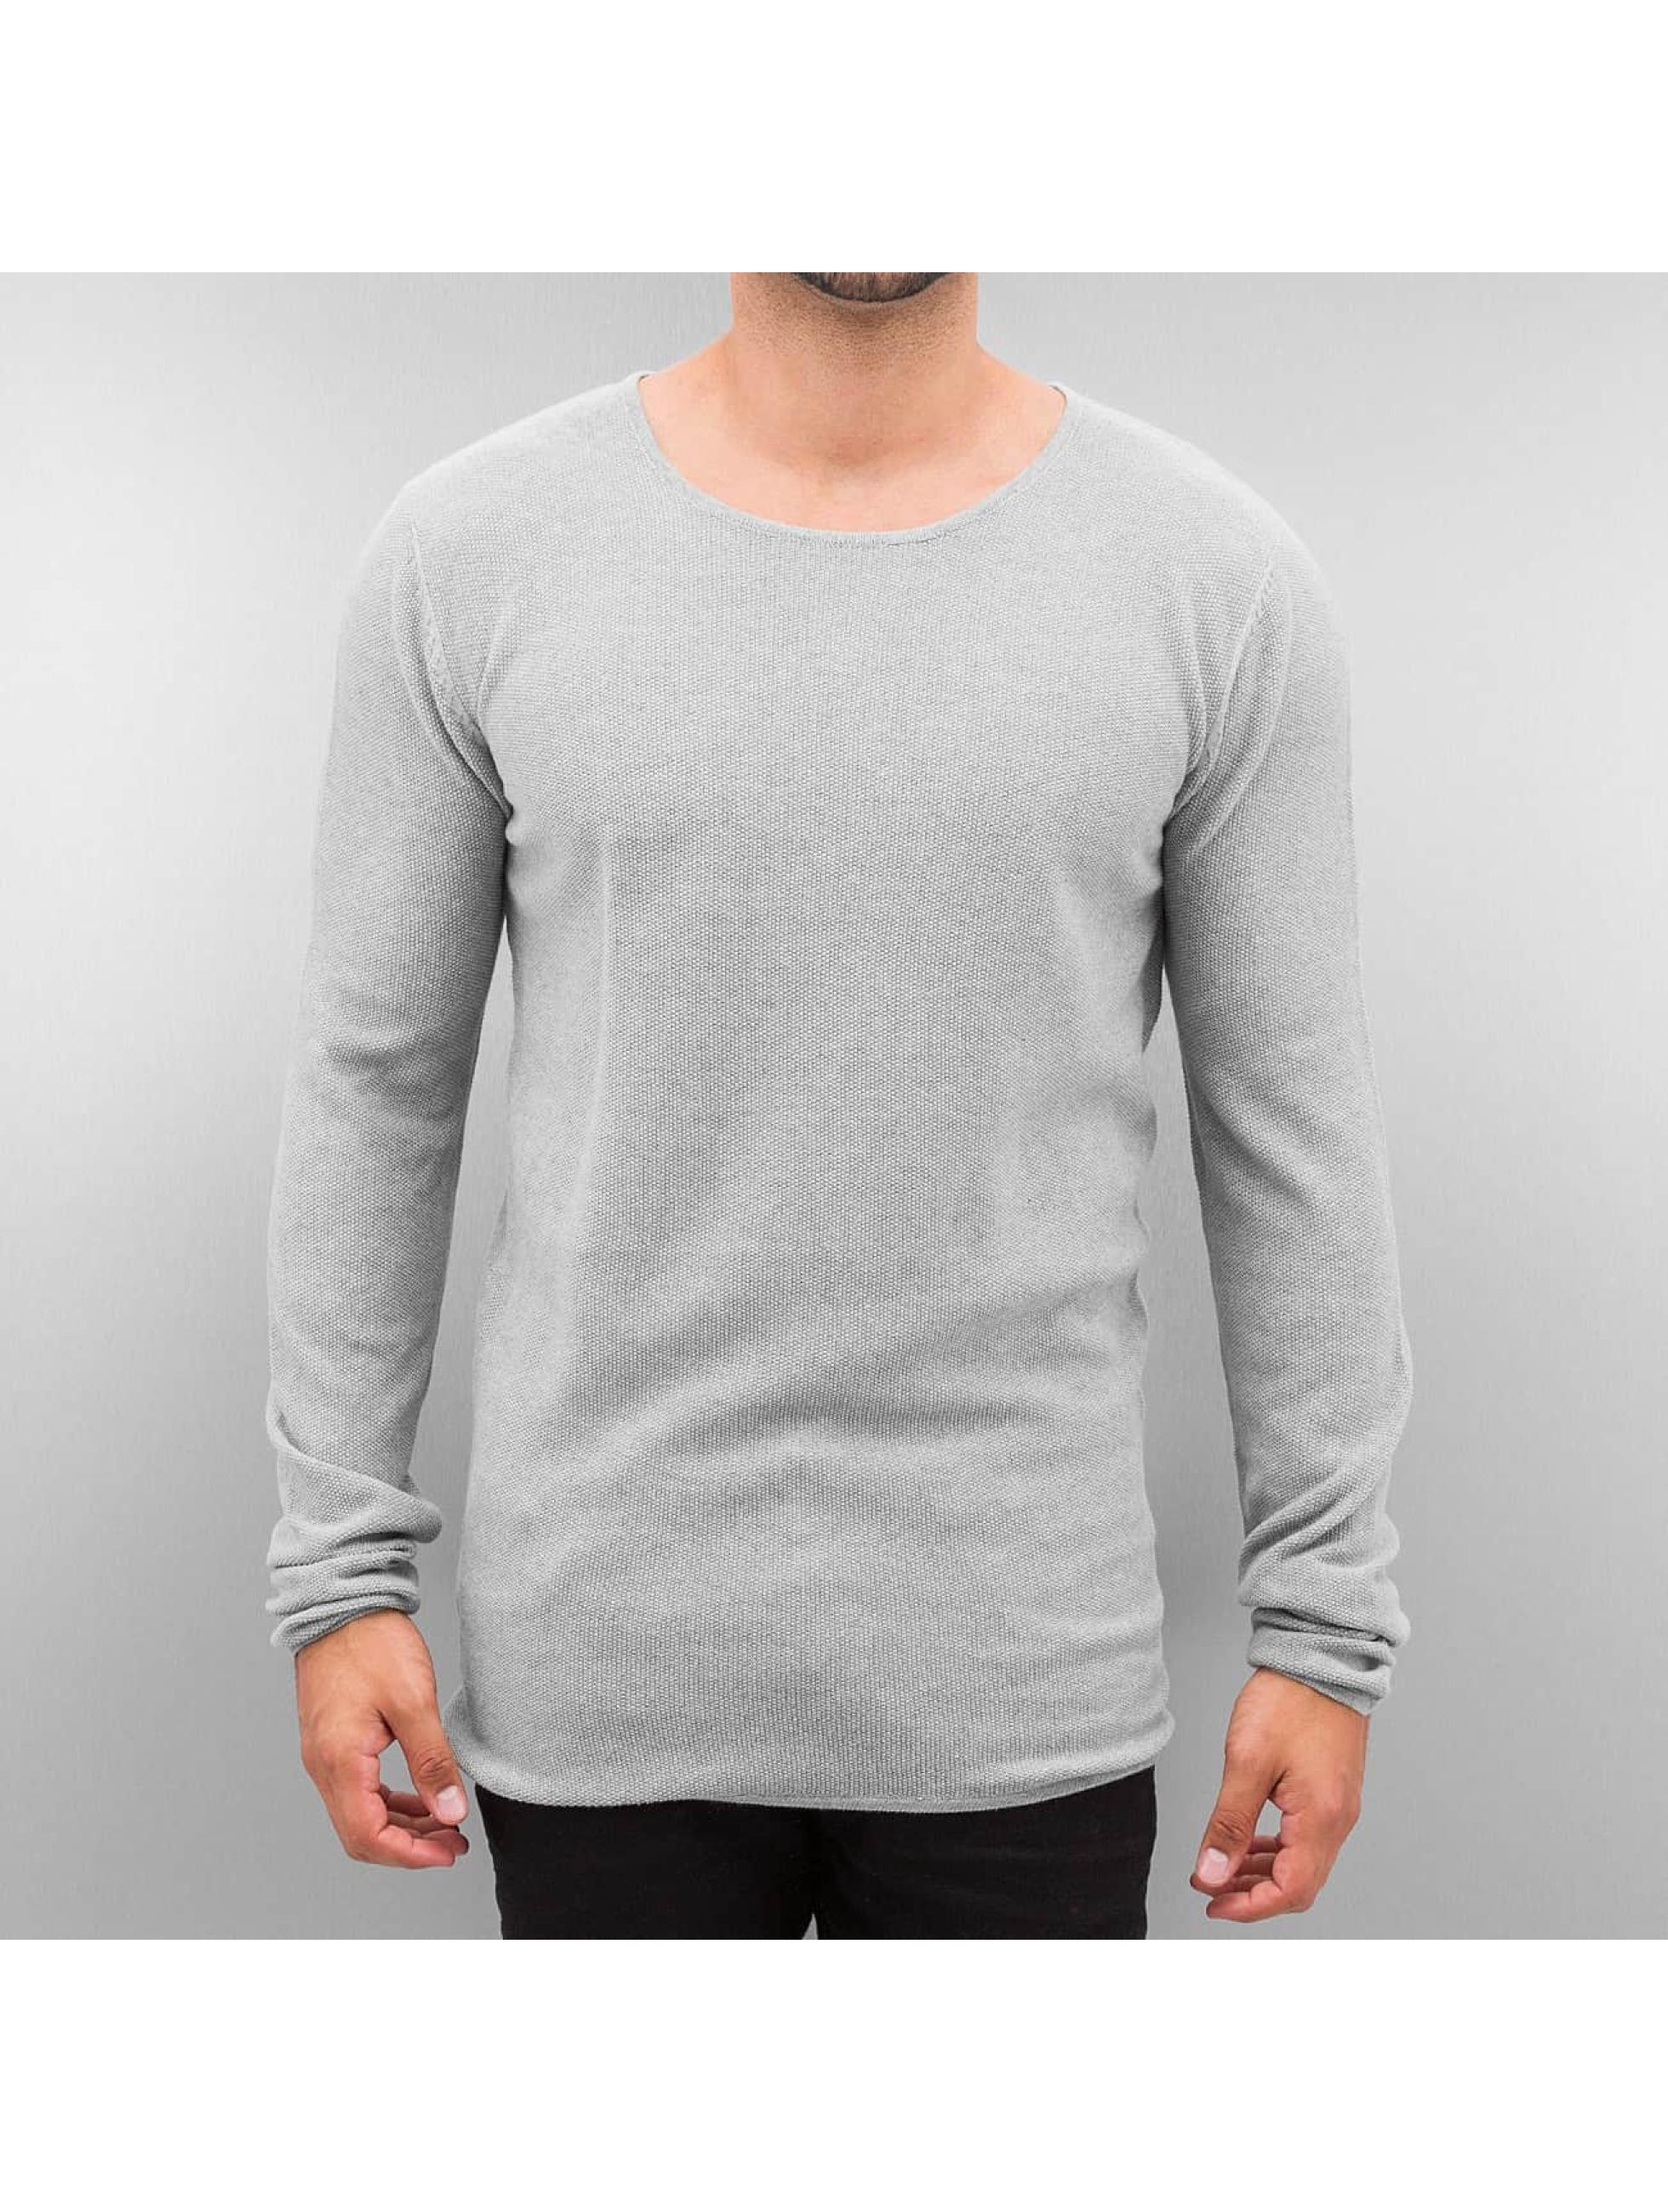 SHINE Original Пуловер Pearl серый